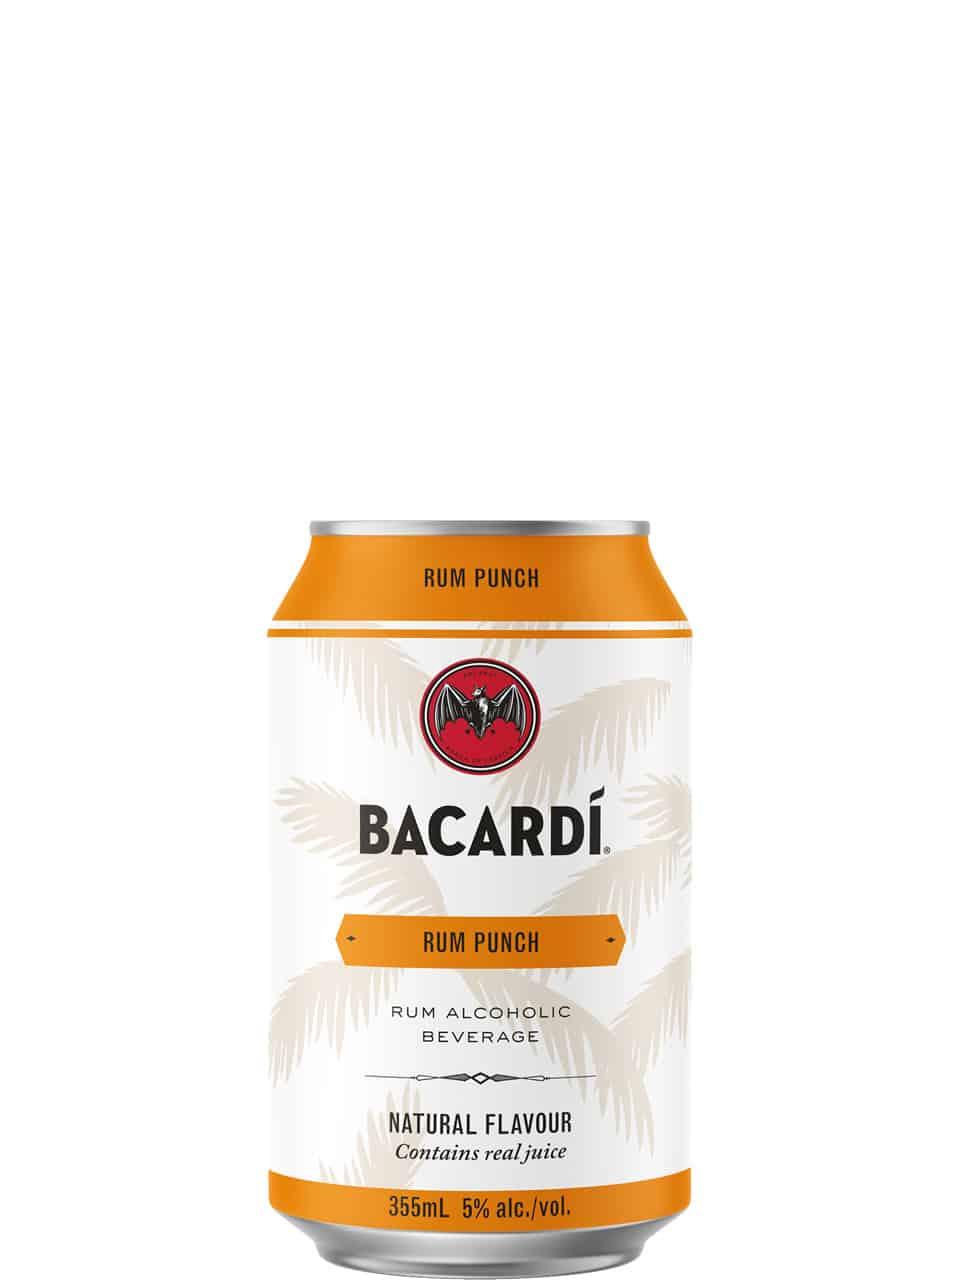 Bacardi Rum Punch 6 Pack